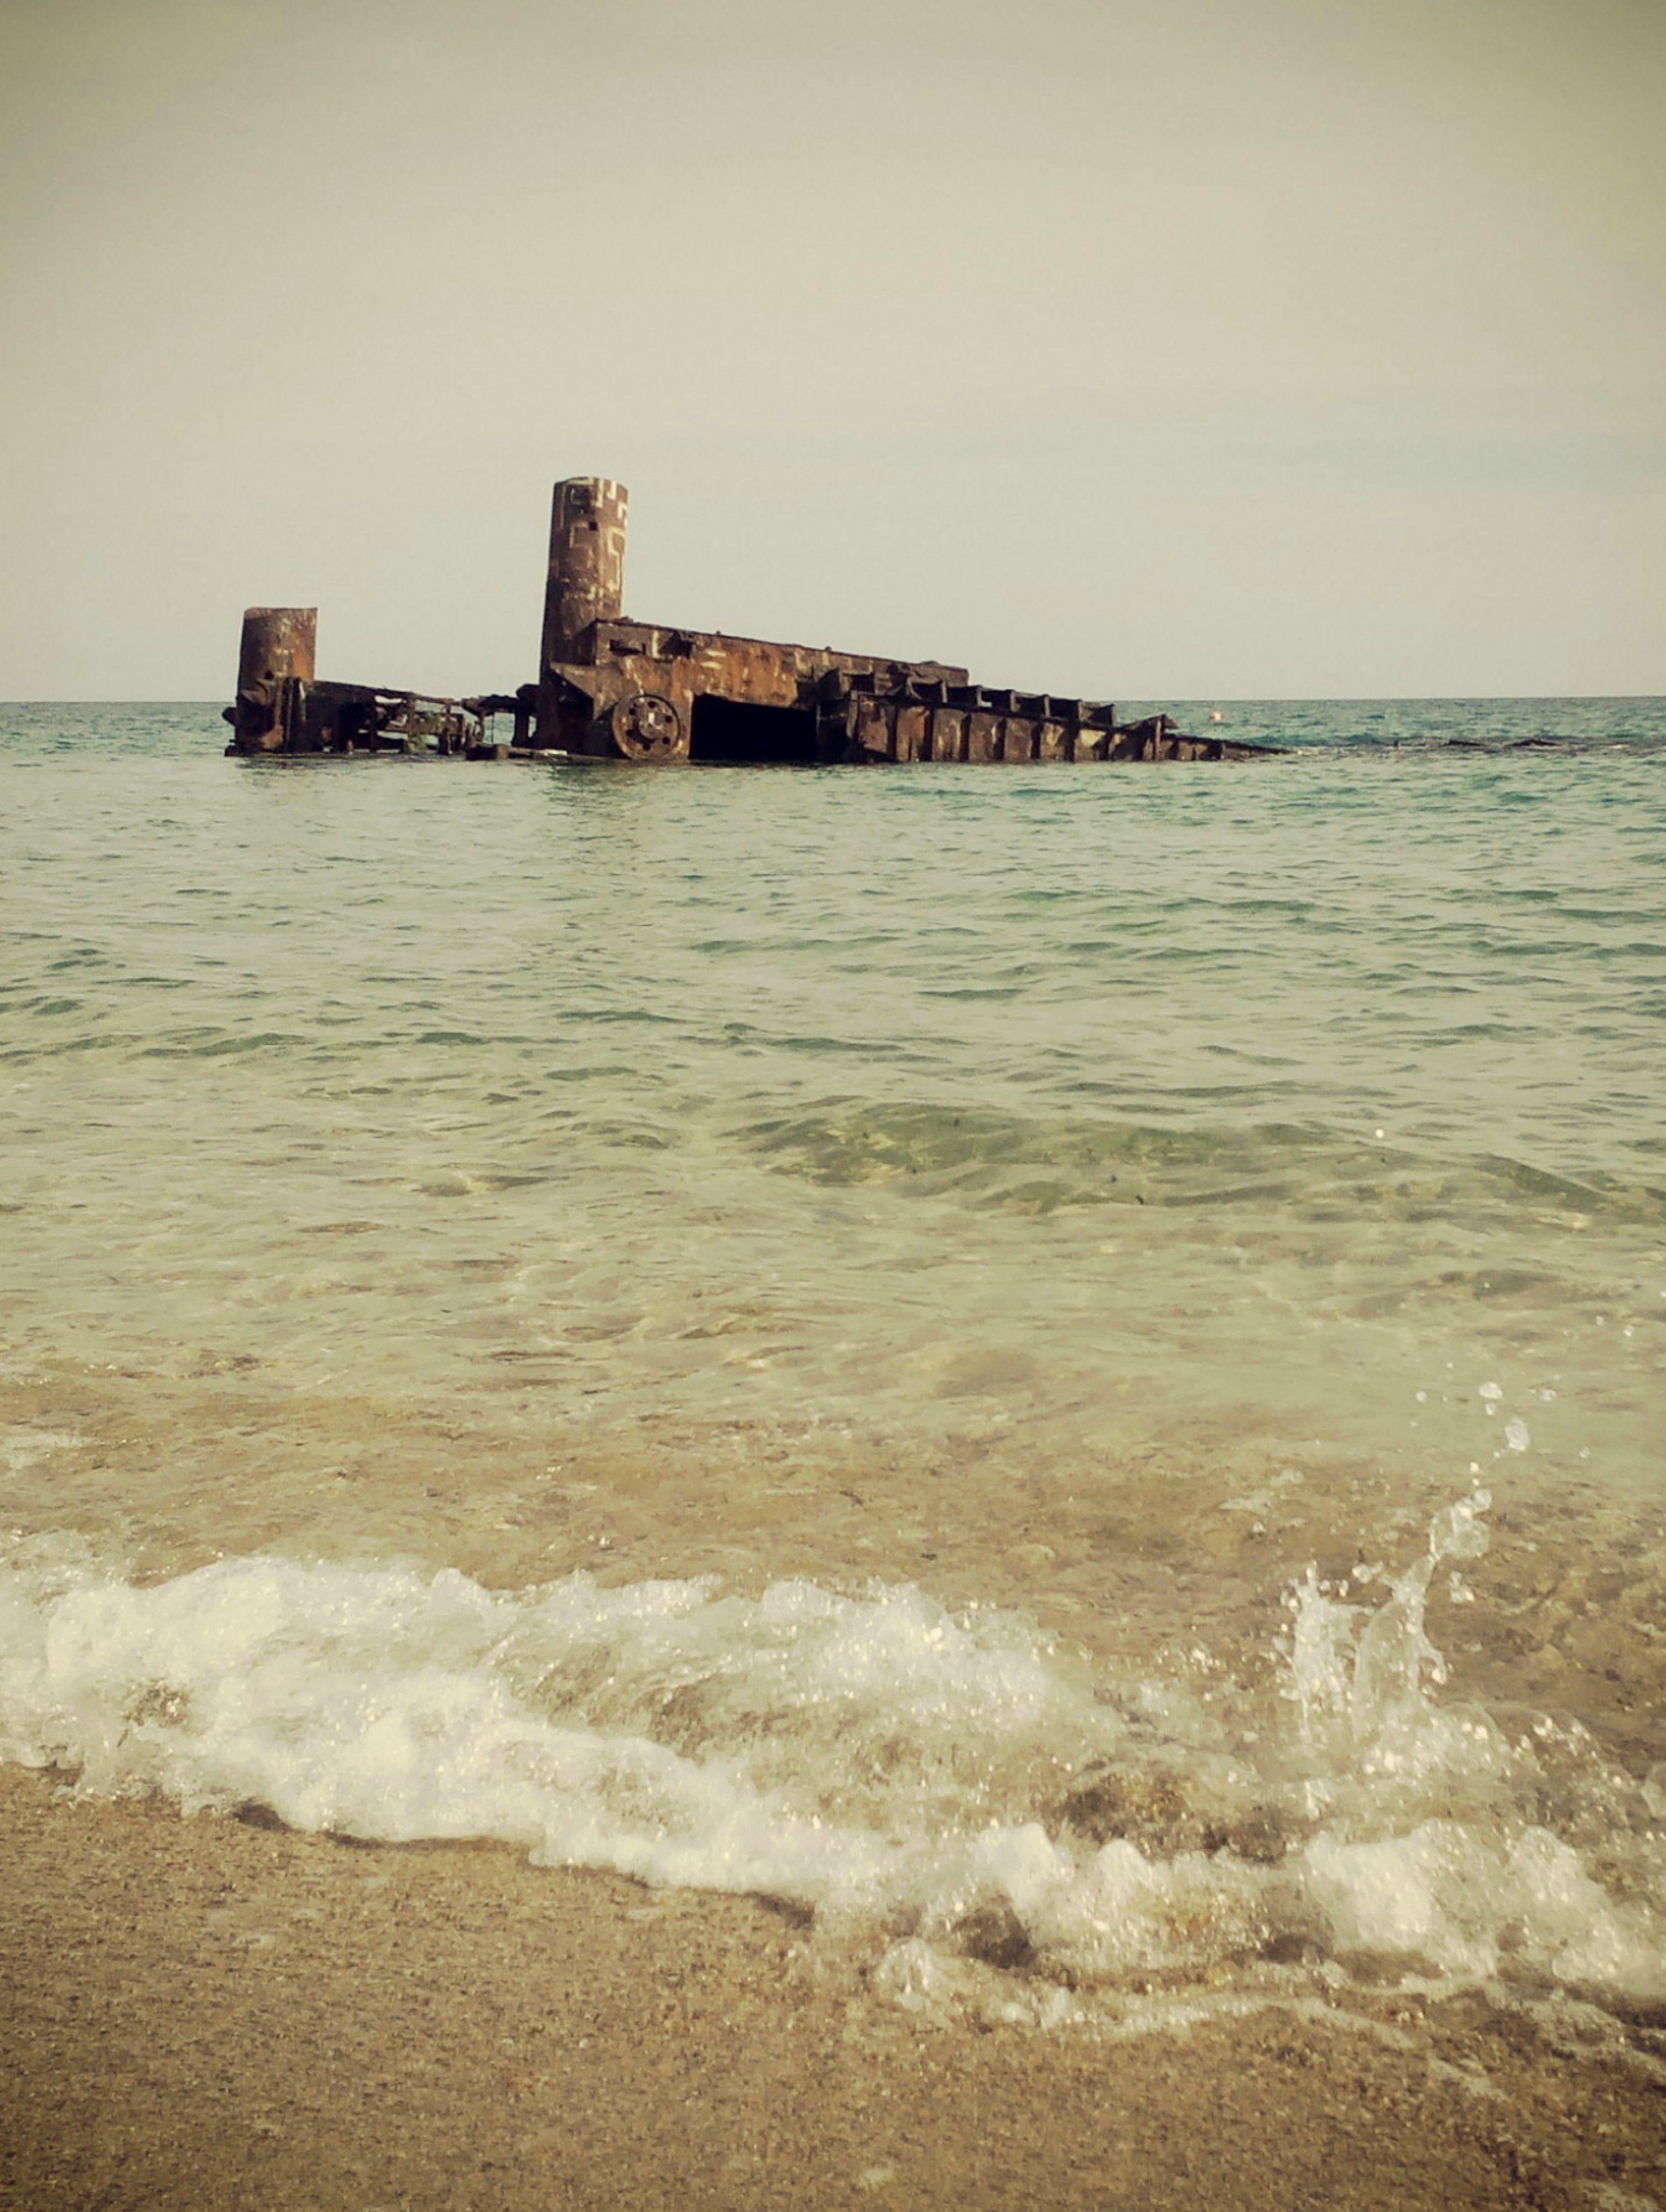 shipwreck - Epanomi, Thessaloniki, Greece